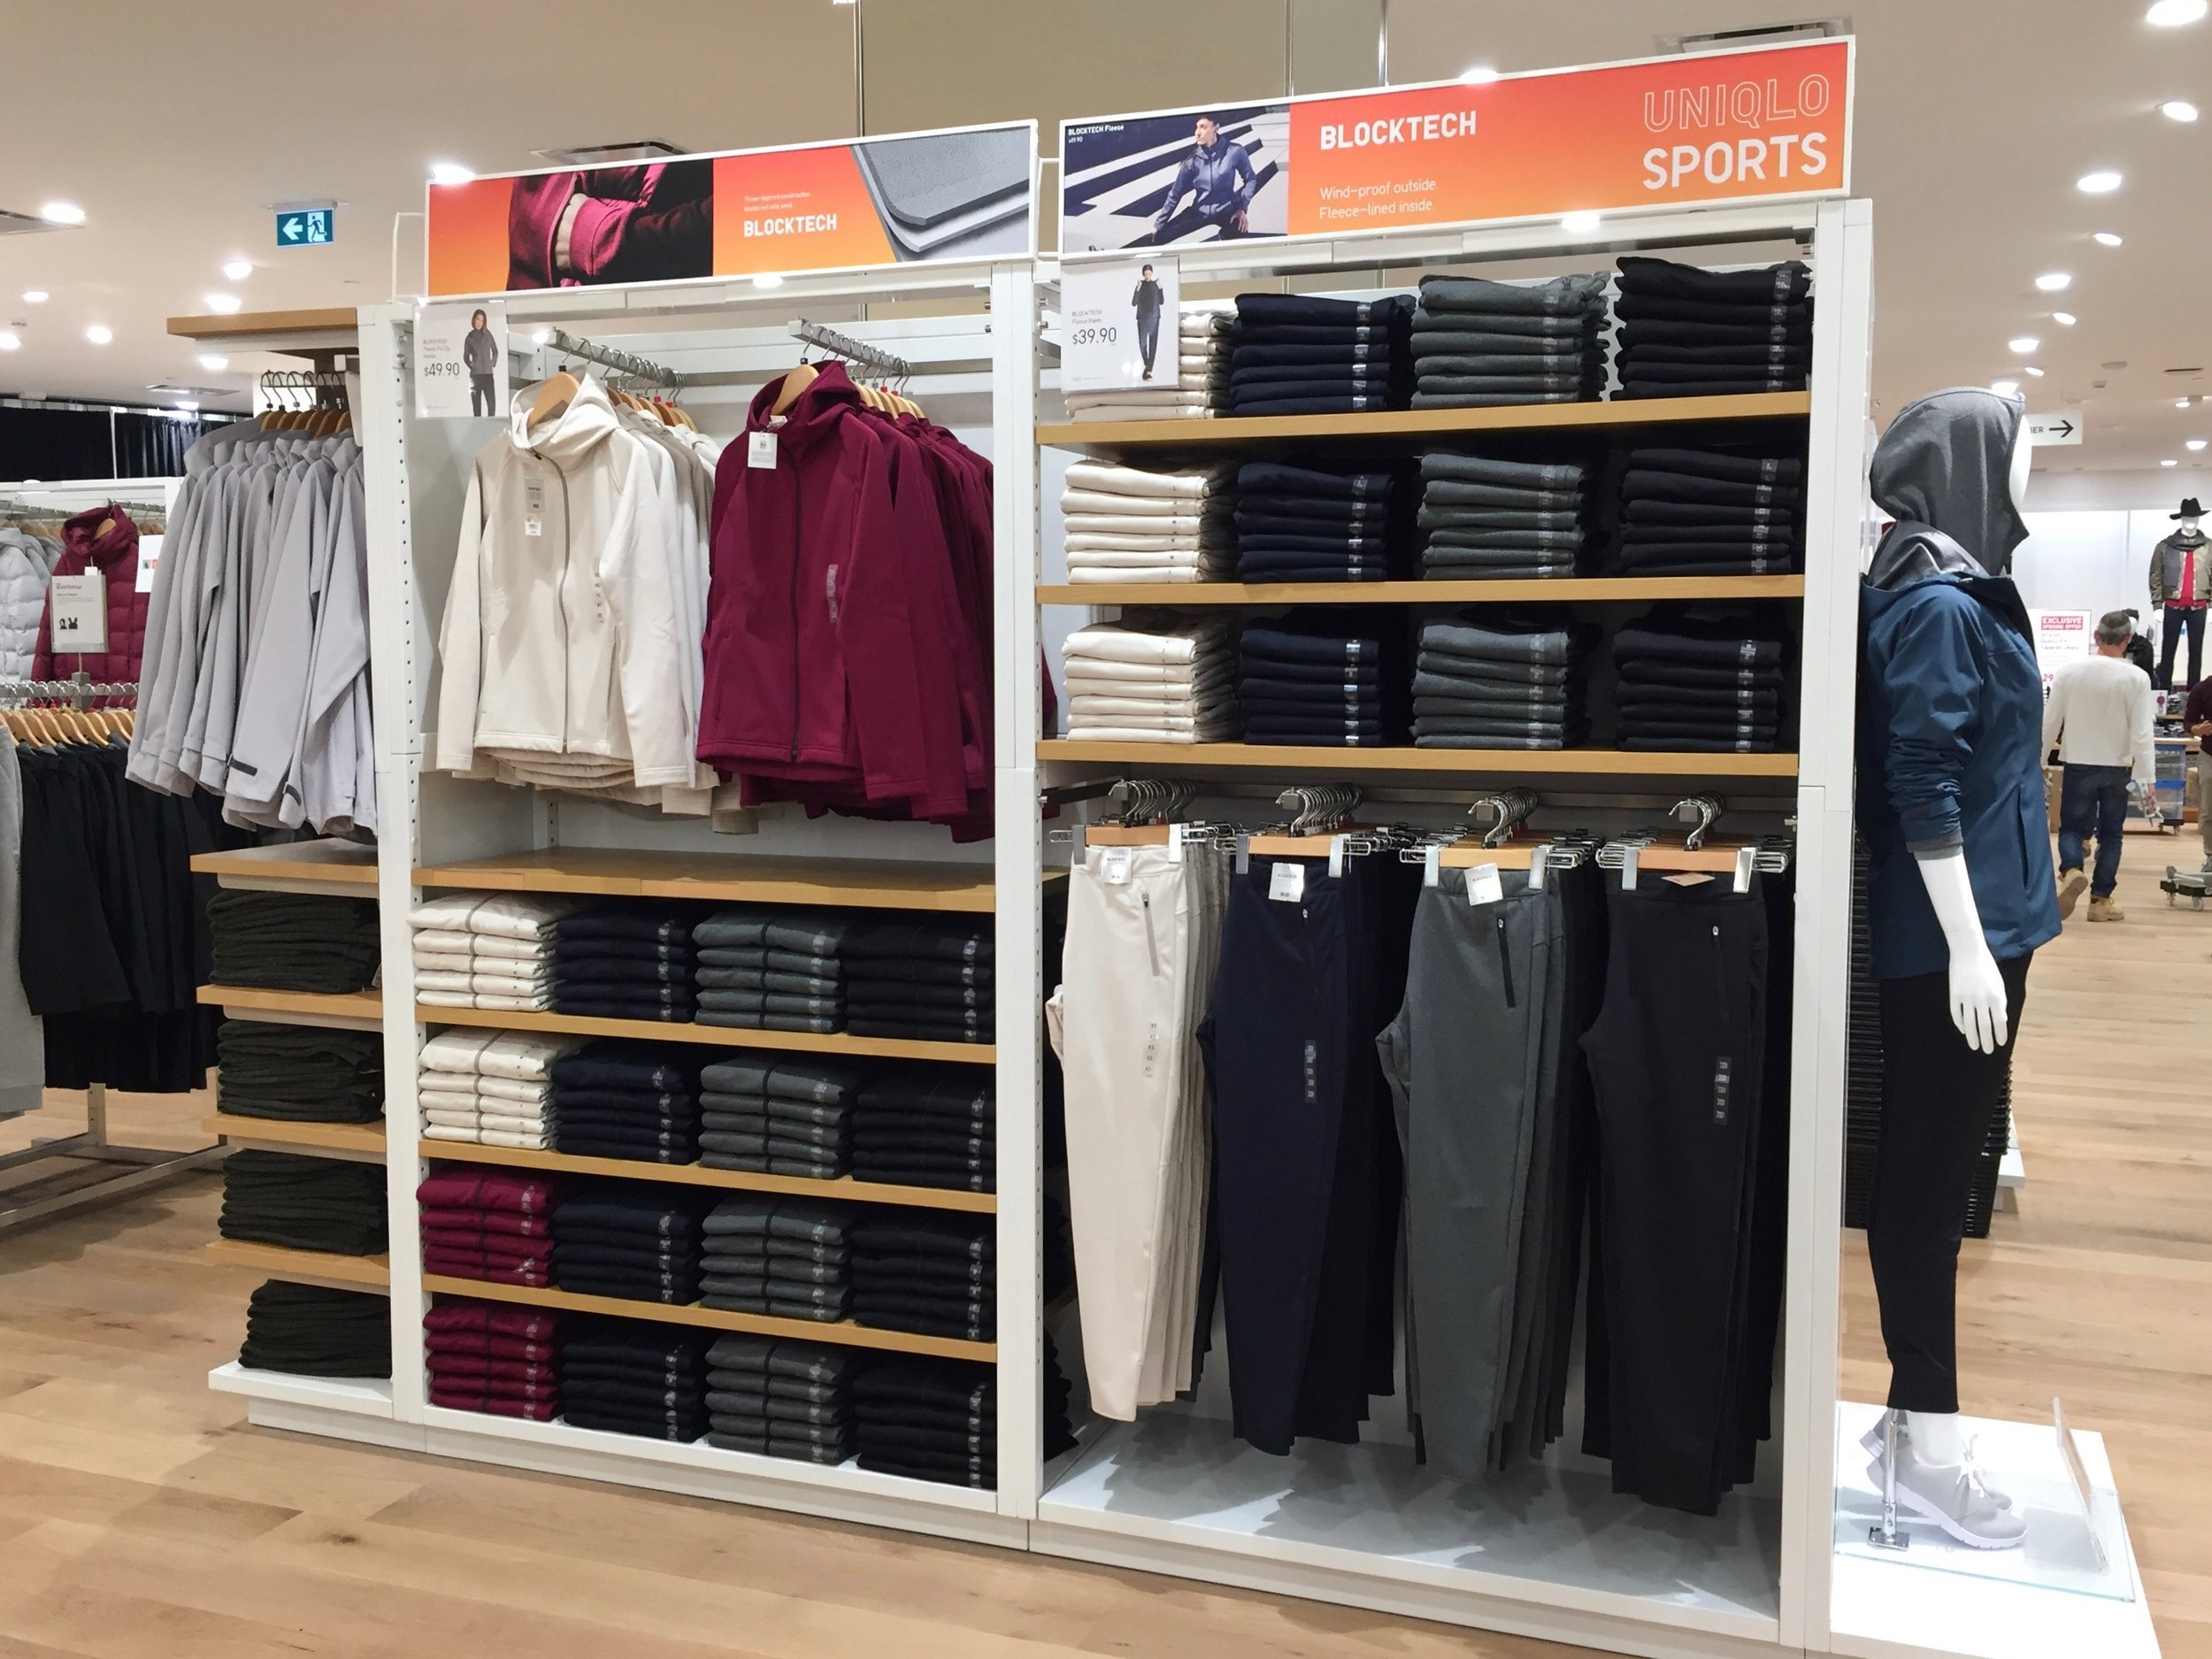 A variety of sportswear using Uniqlo's BlockTech fabric.Photo: Devon Johnson